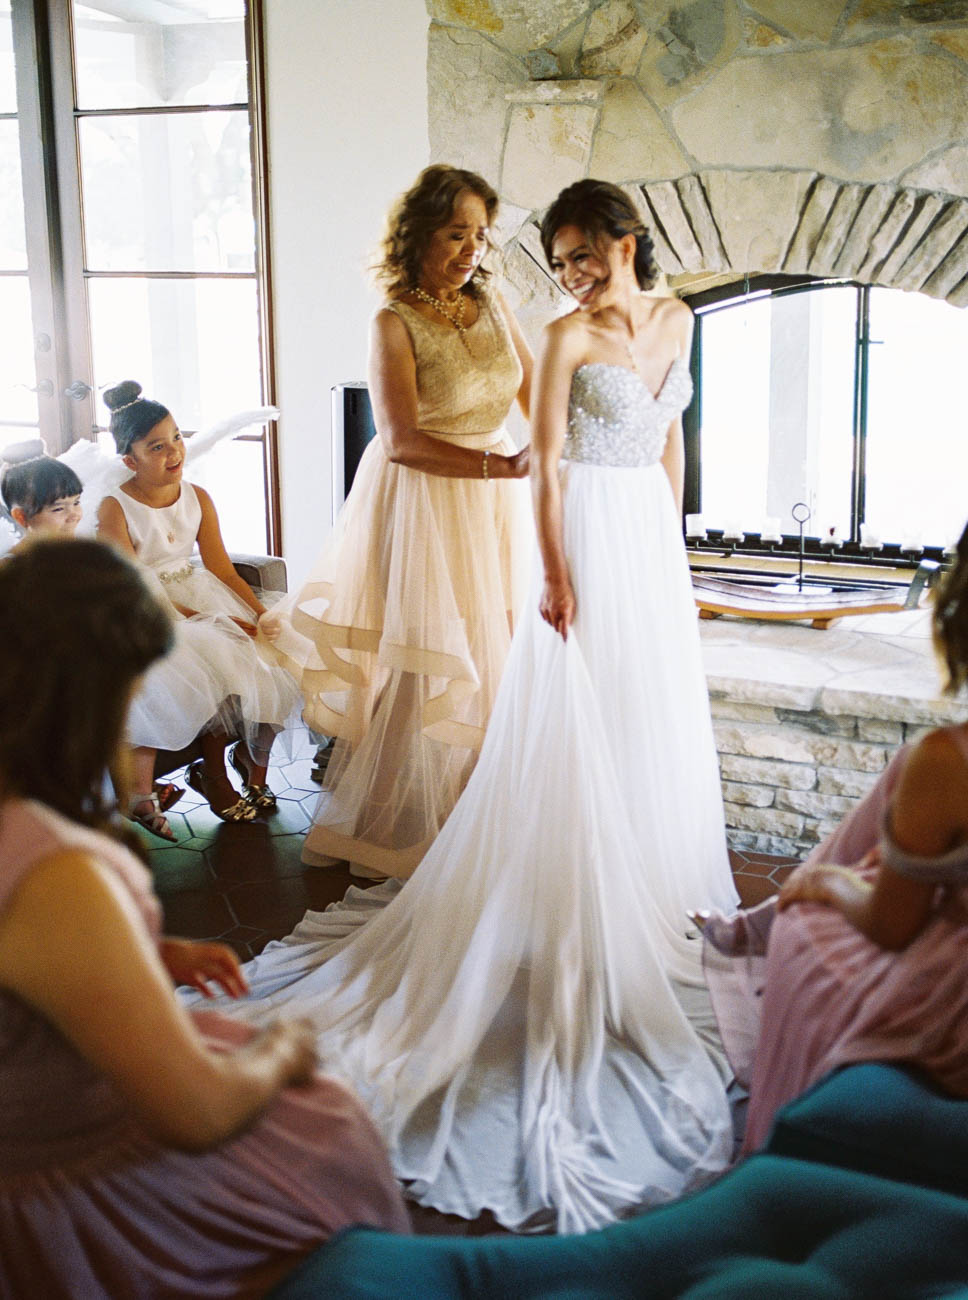 dennisroycoronel_wedding-17.jpg